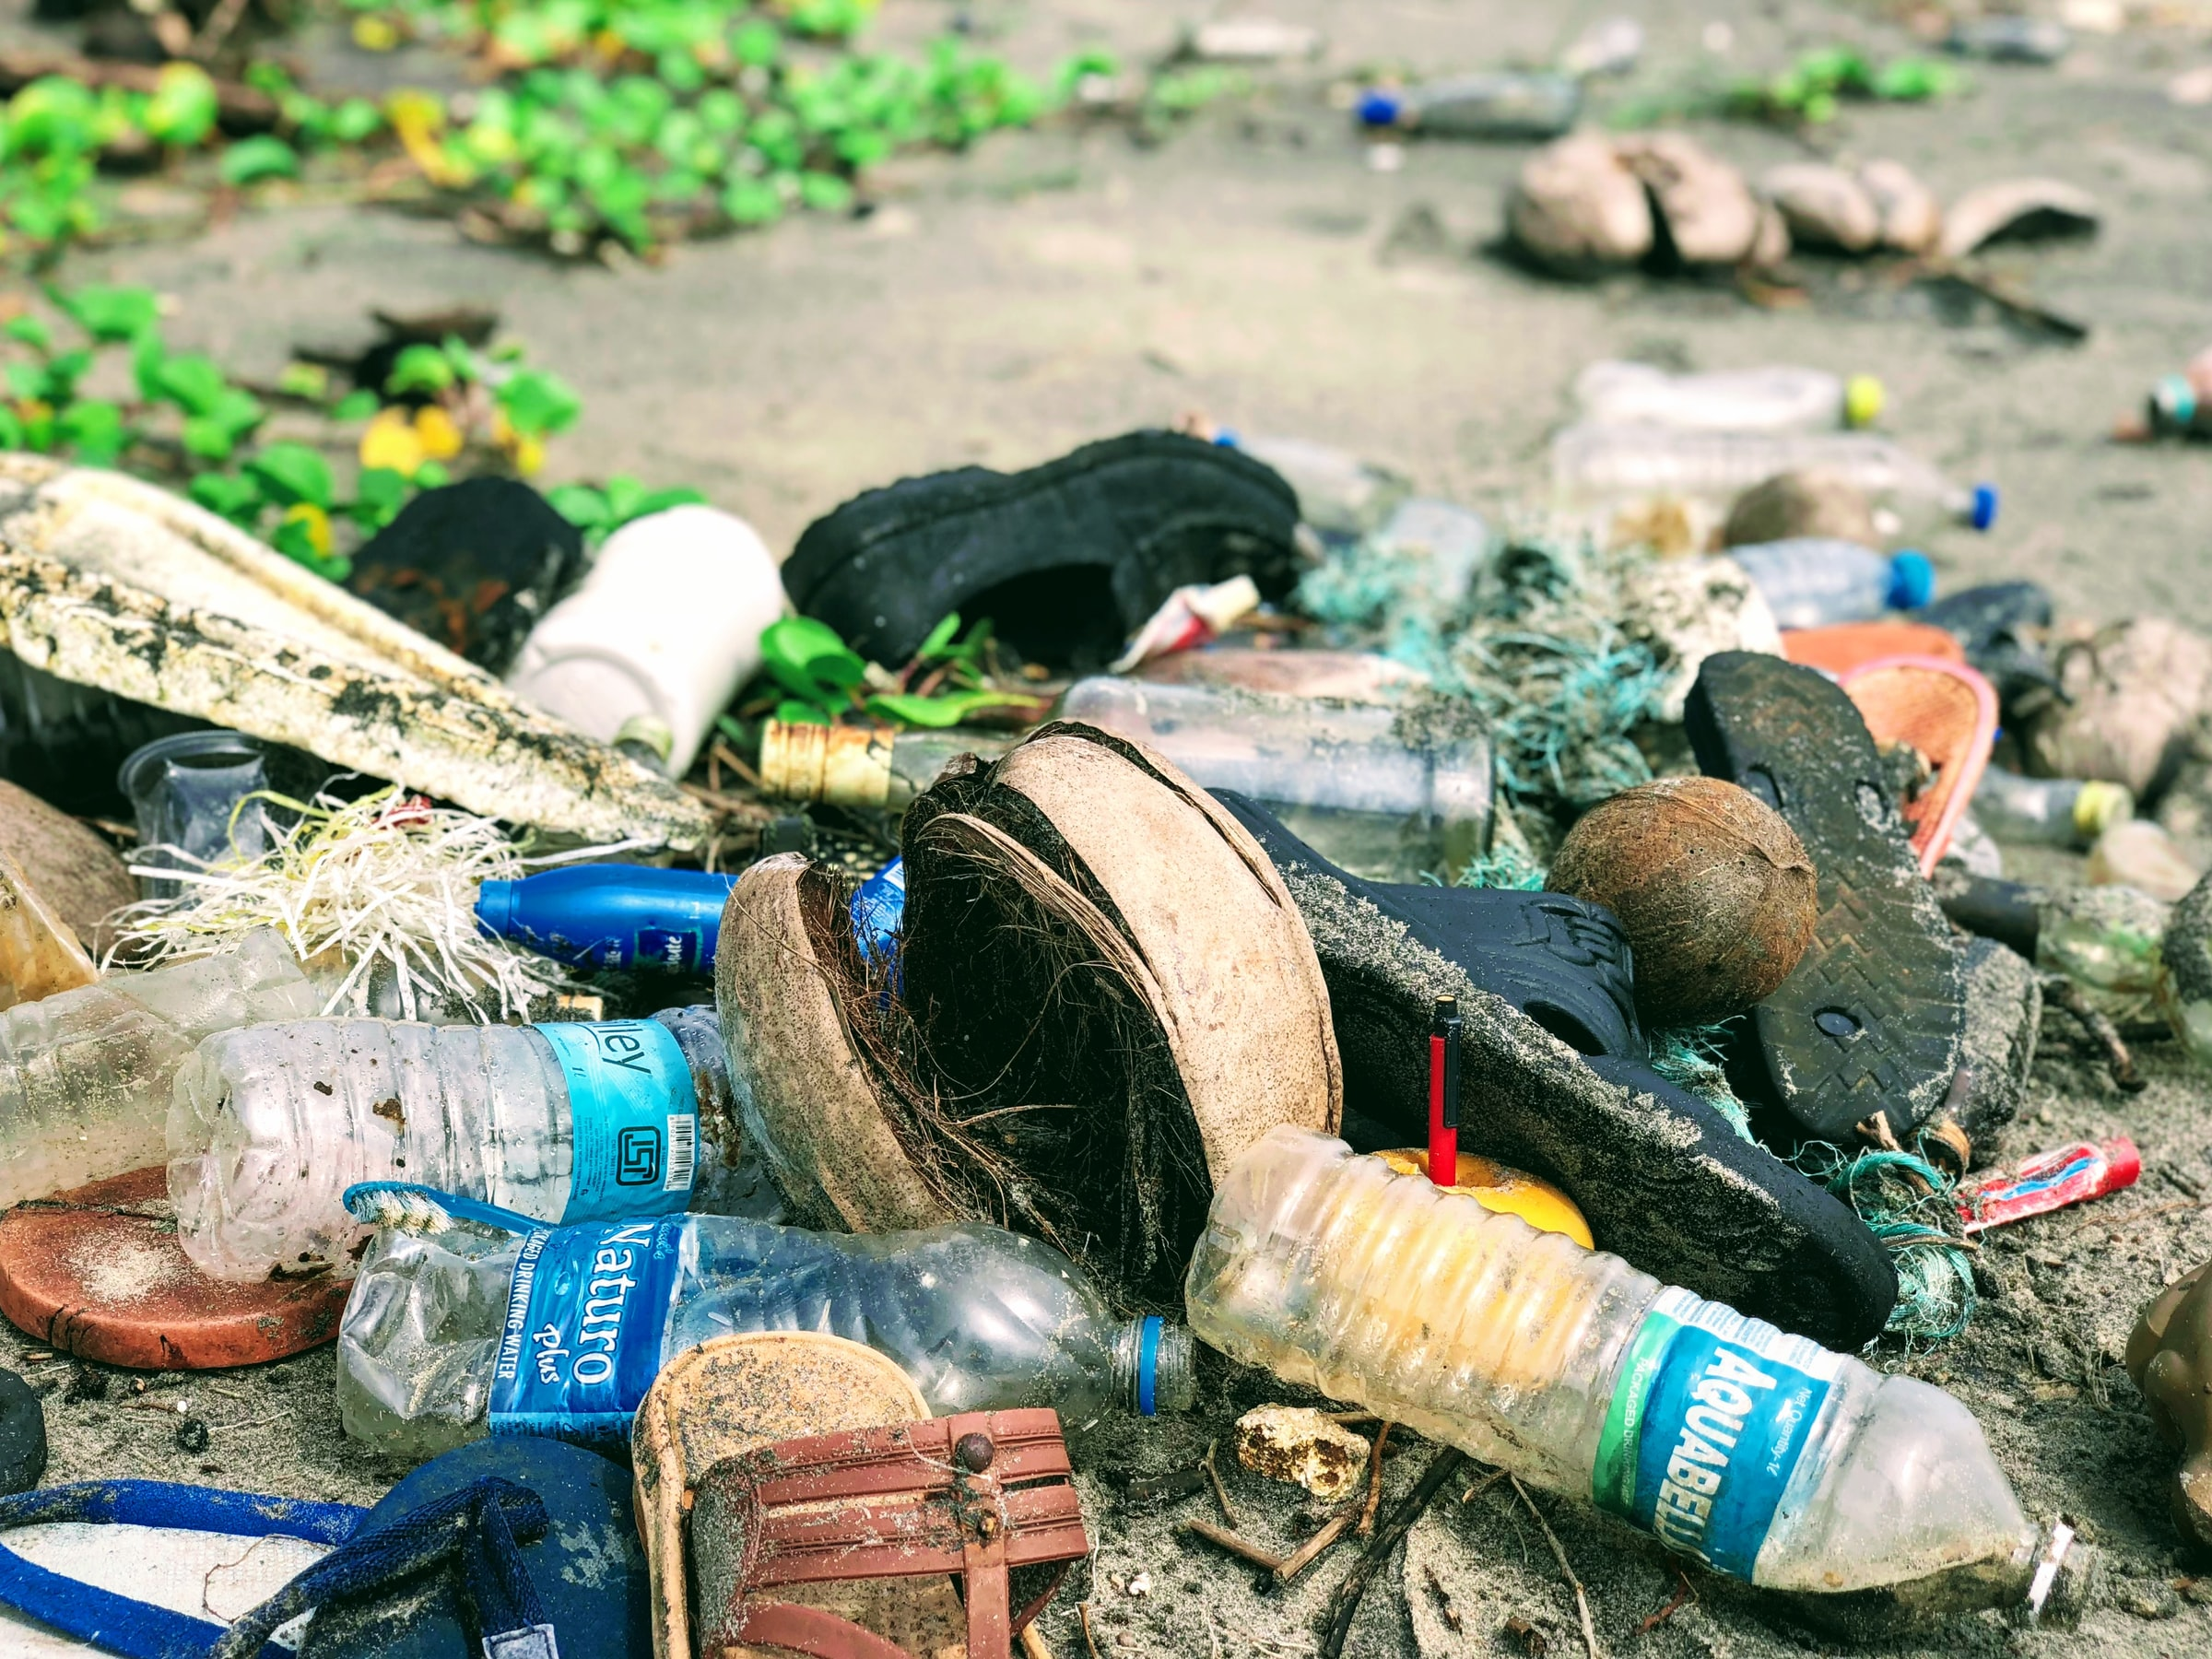 rubbish, plastics